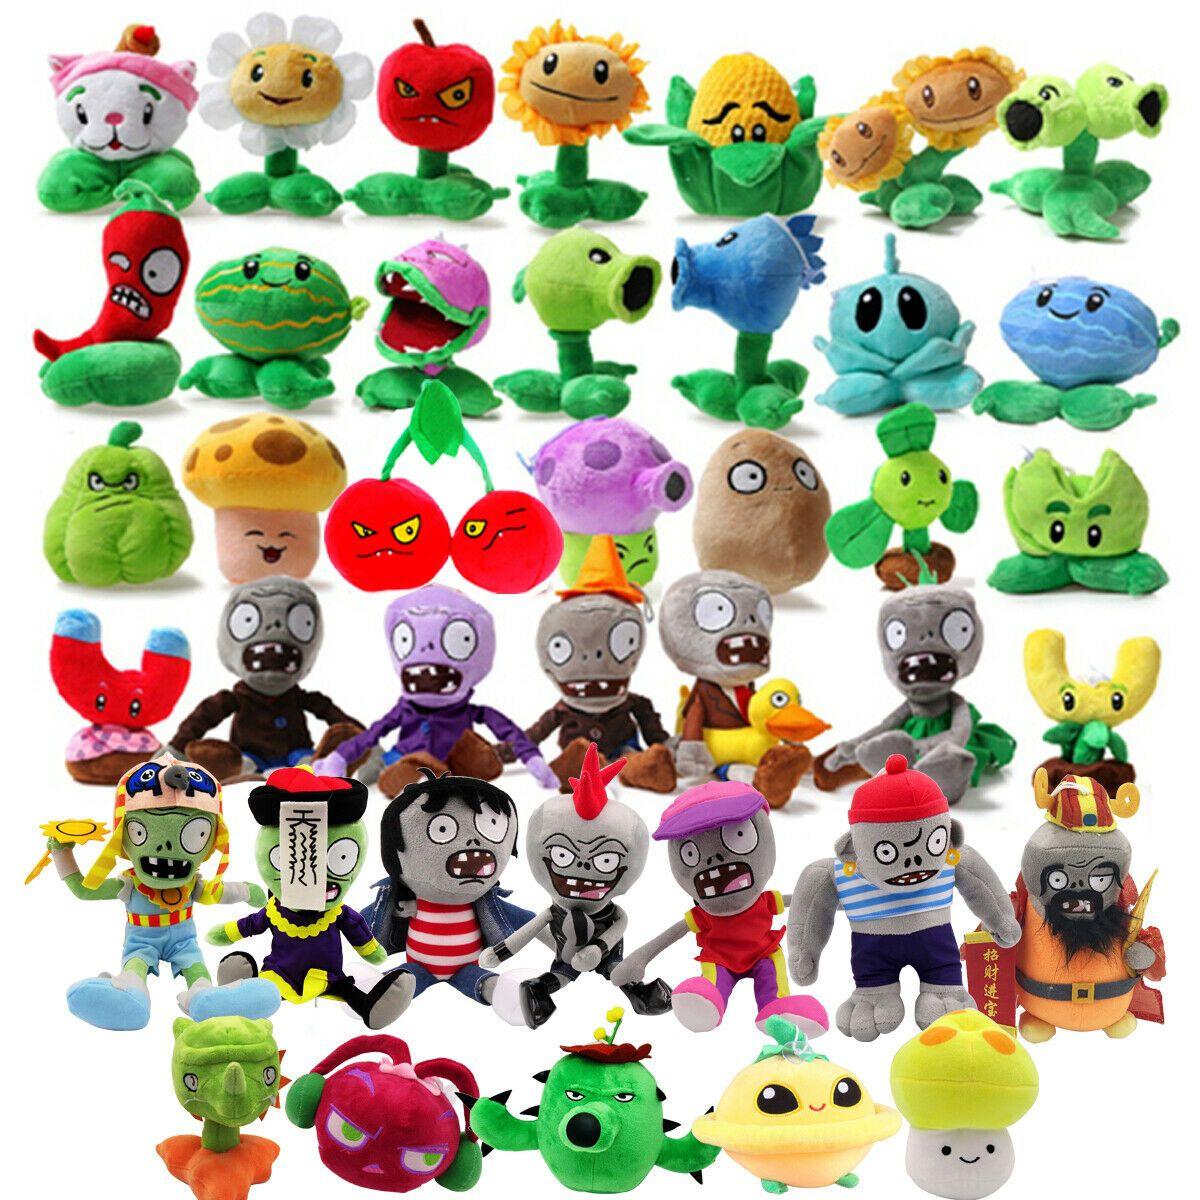 Plants vs Zombies 2 PVZ Figures Plush Baby Staff Toy Stuffed Soft Doll 13-35CM@!